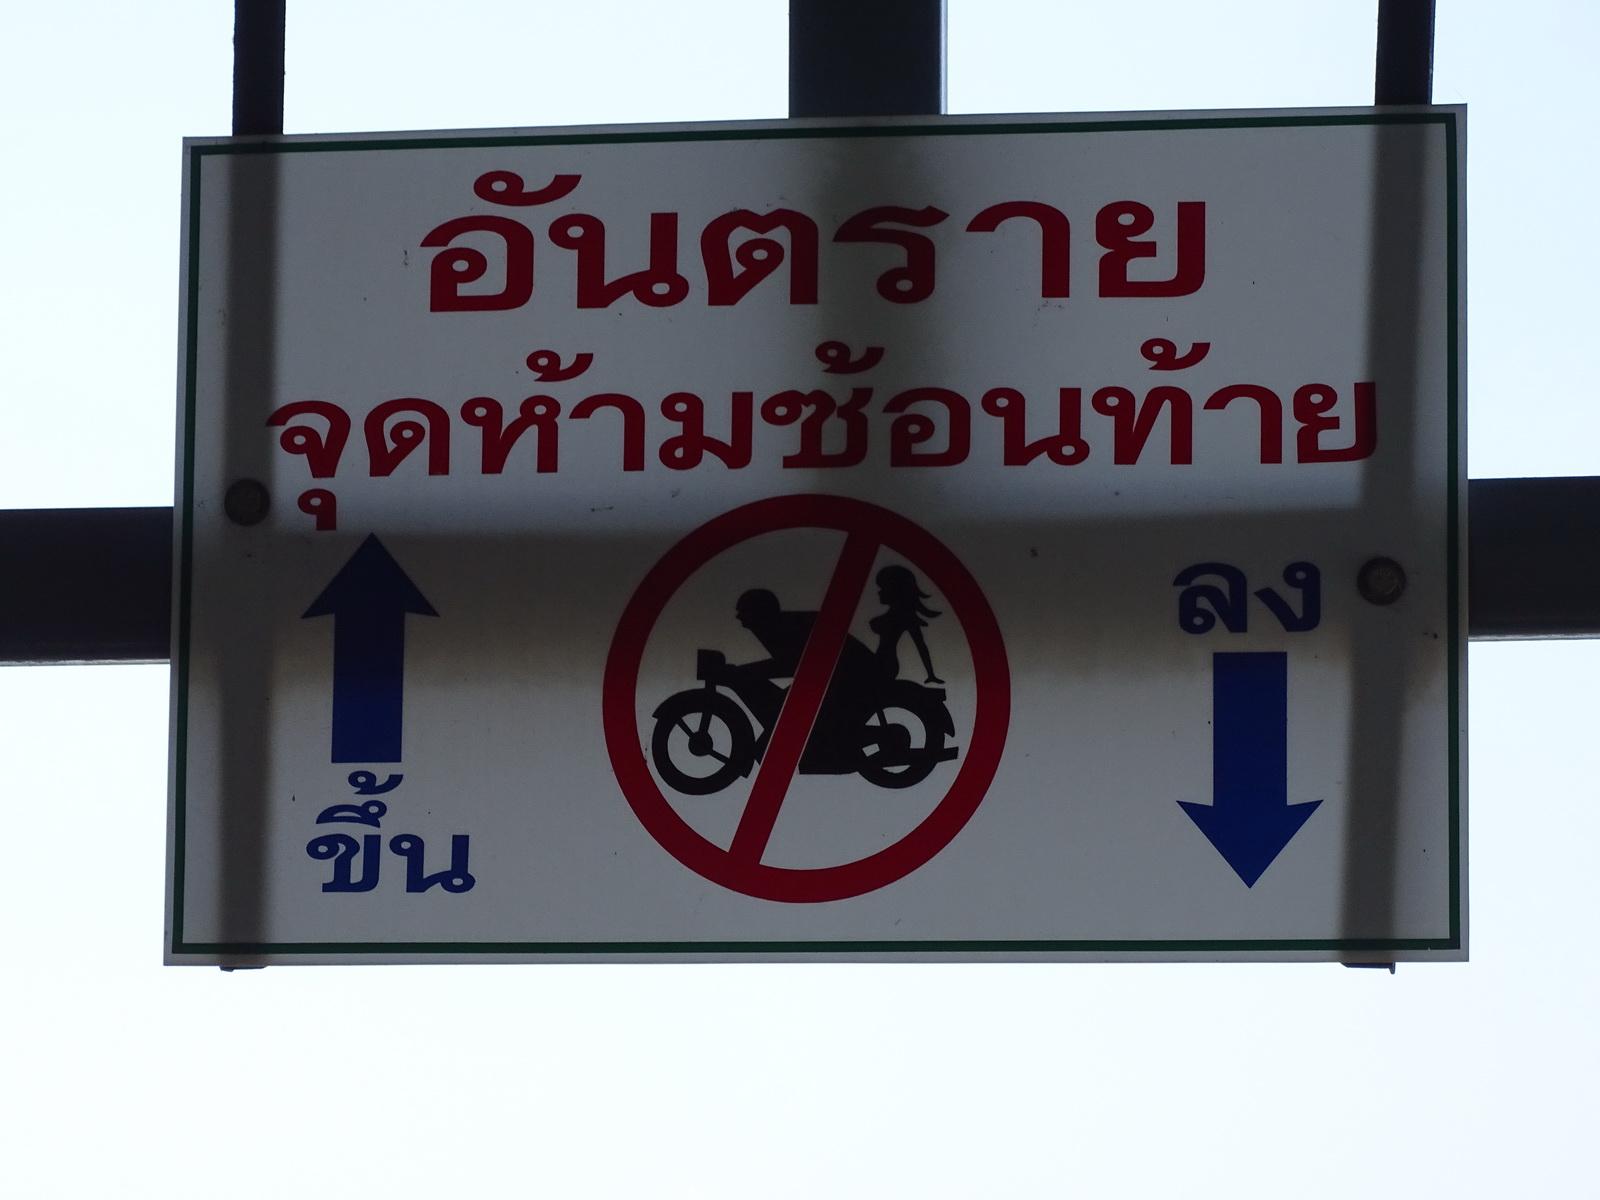 04 Bangkok 039